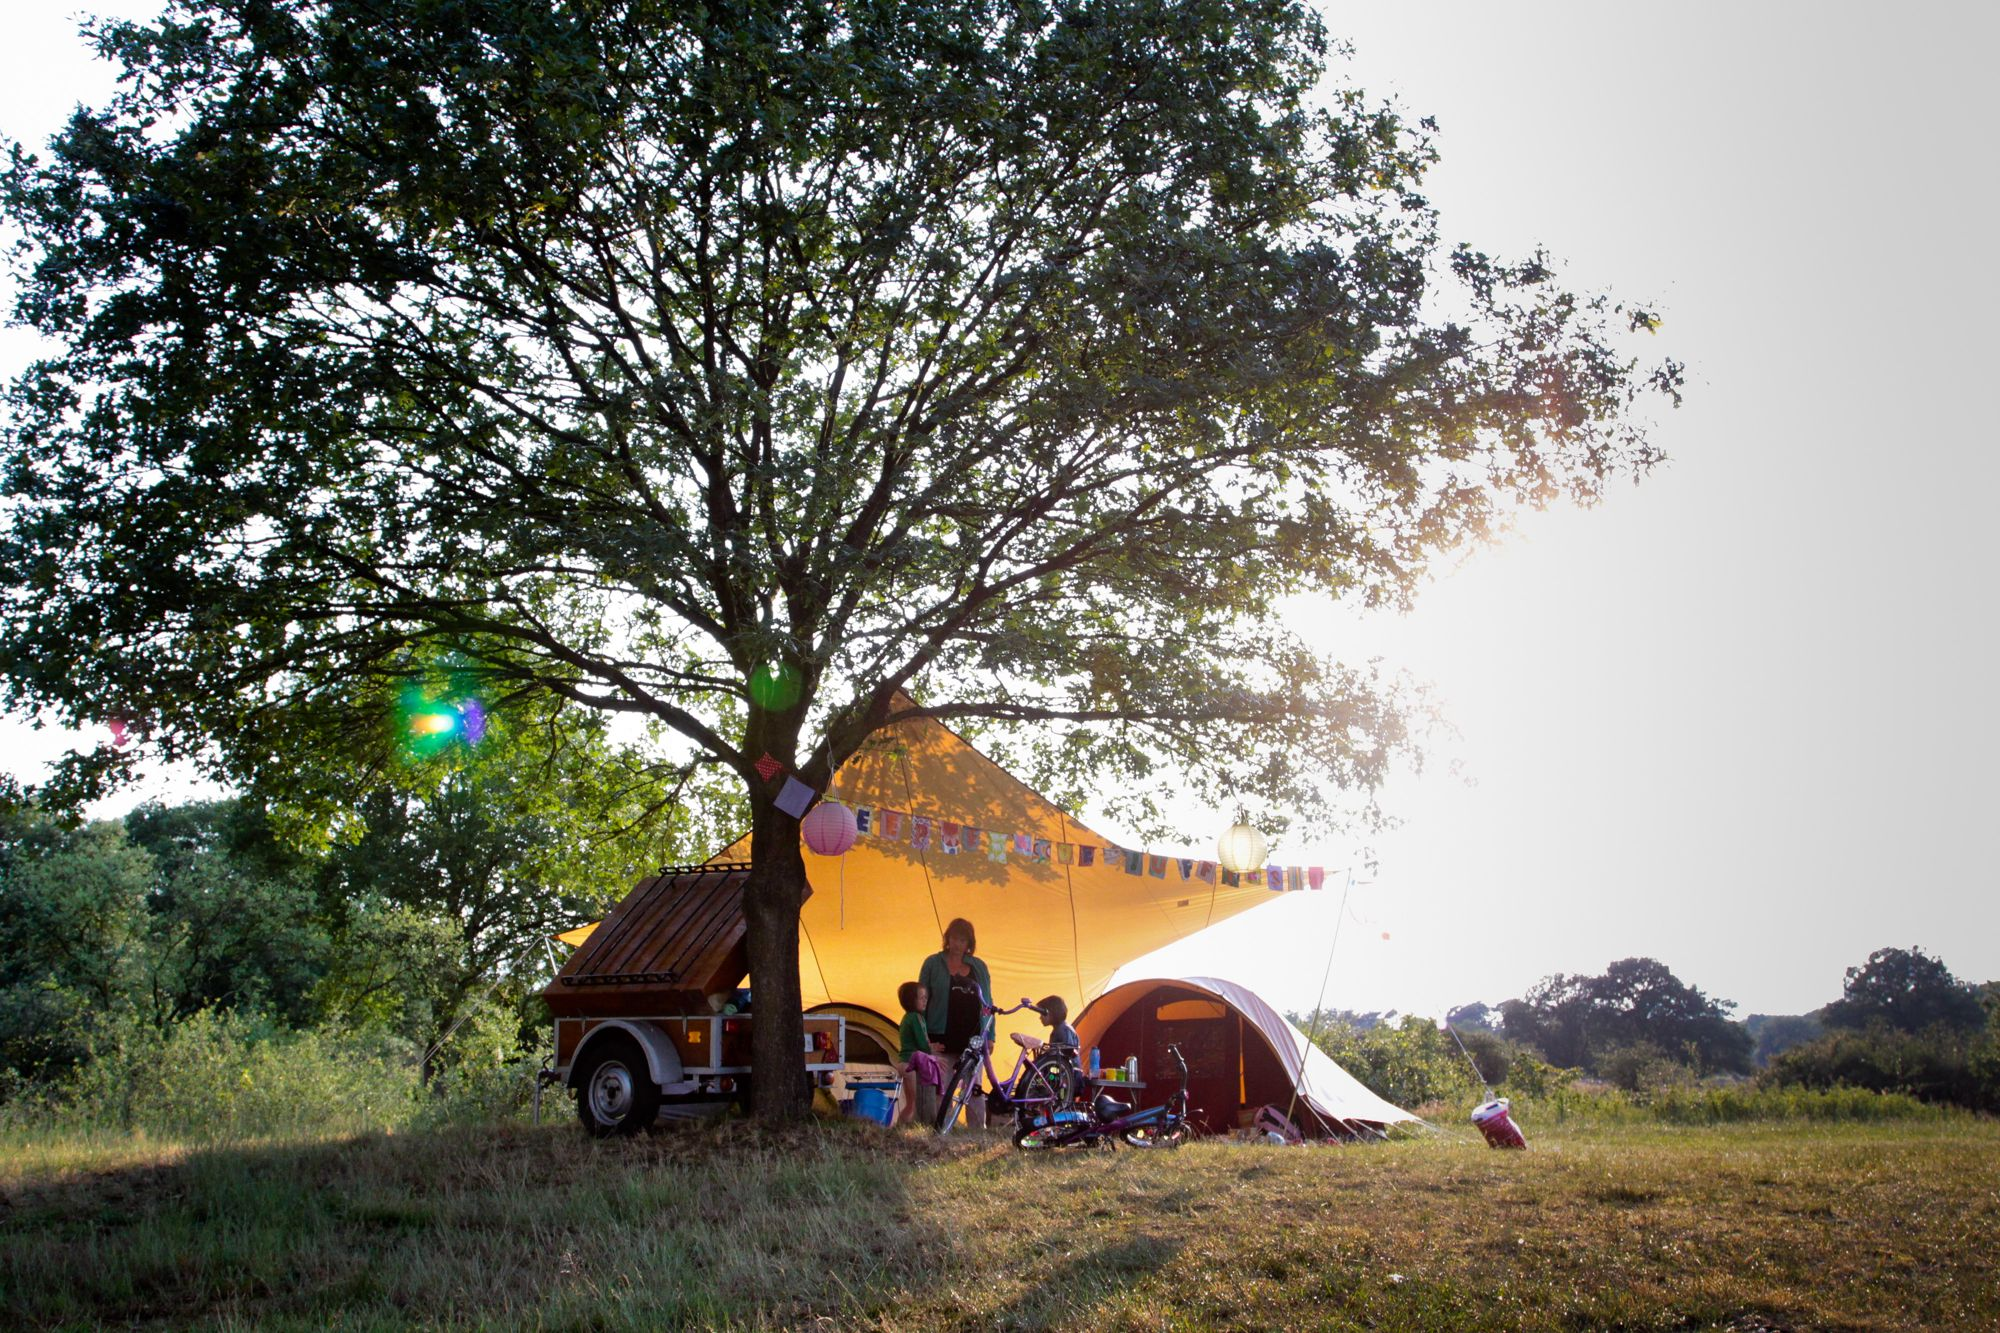 Campsites in Overijssel – Cool Camping